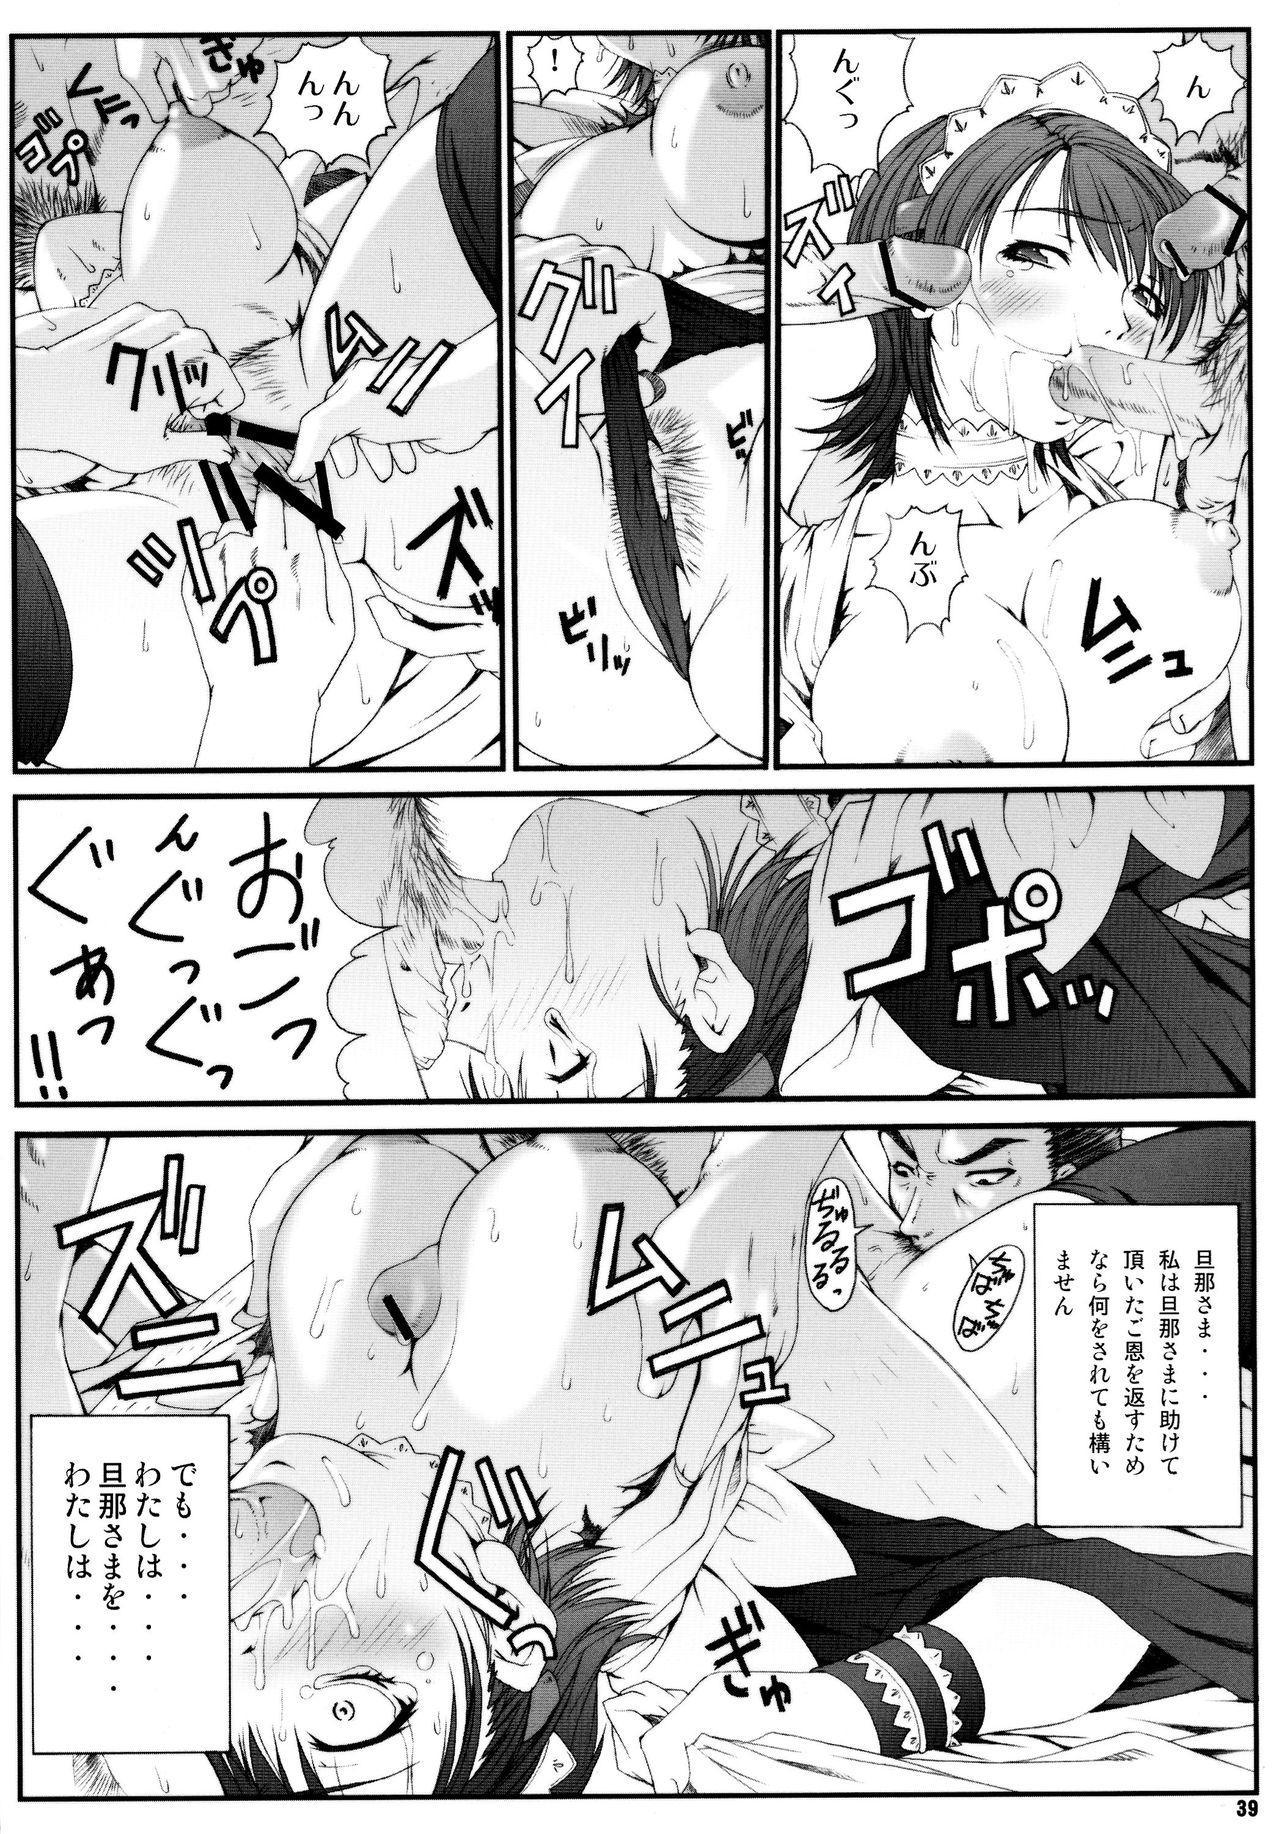 Misoka no 5 38